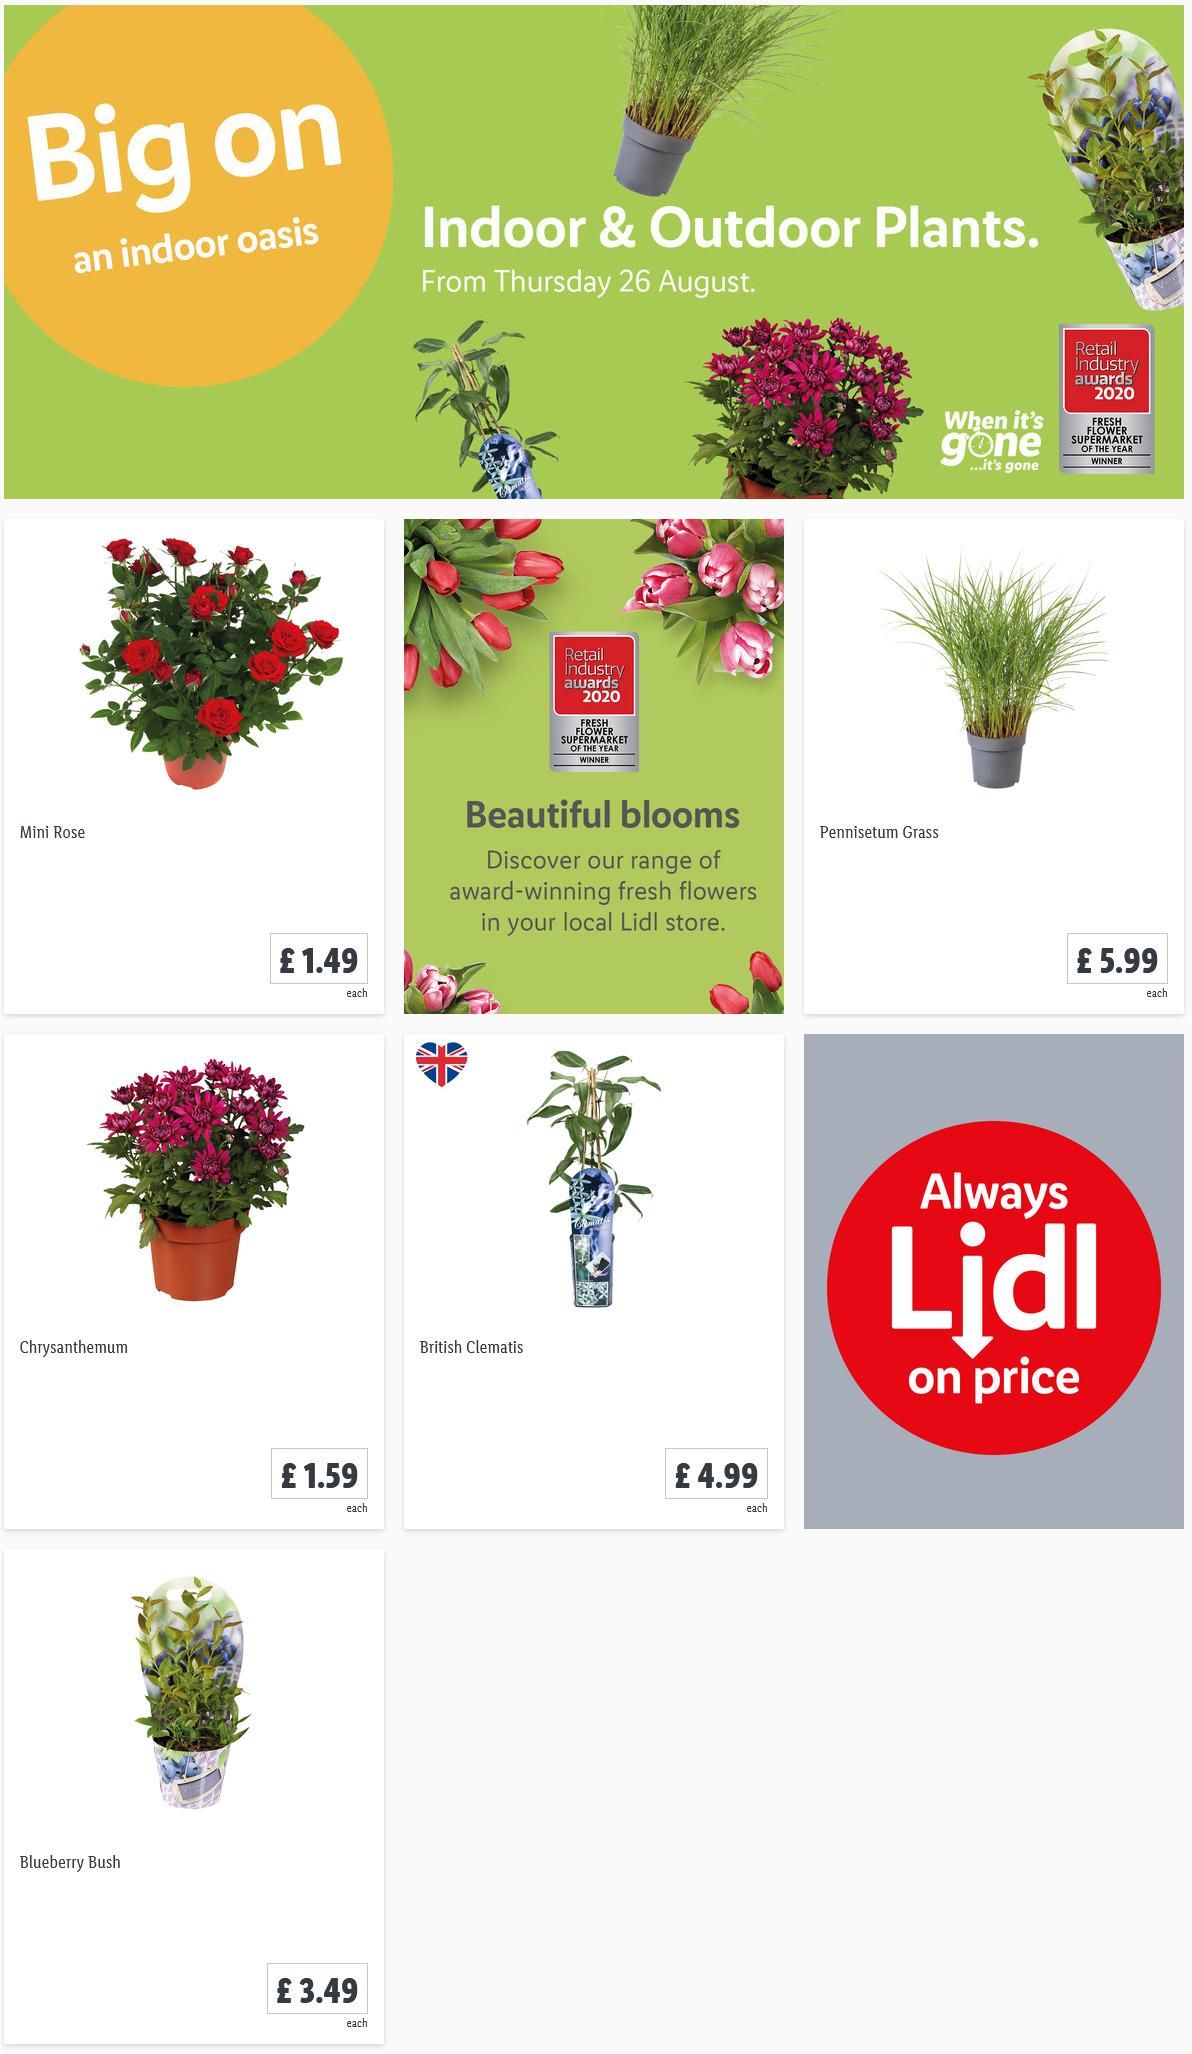 Preview LIDLIndoor & Outdoor Plants Offers for your garden valid from 26/8/2021